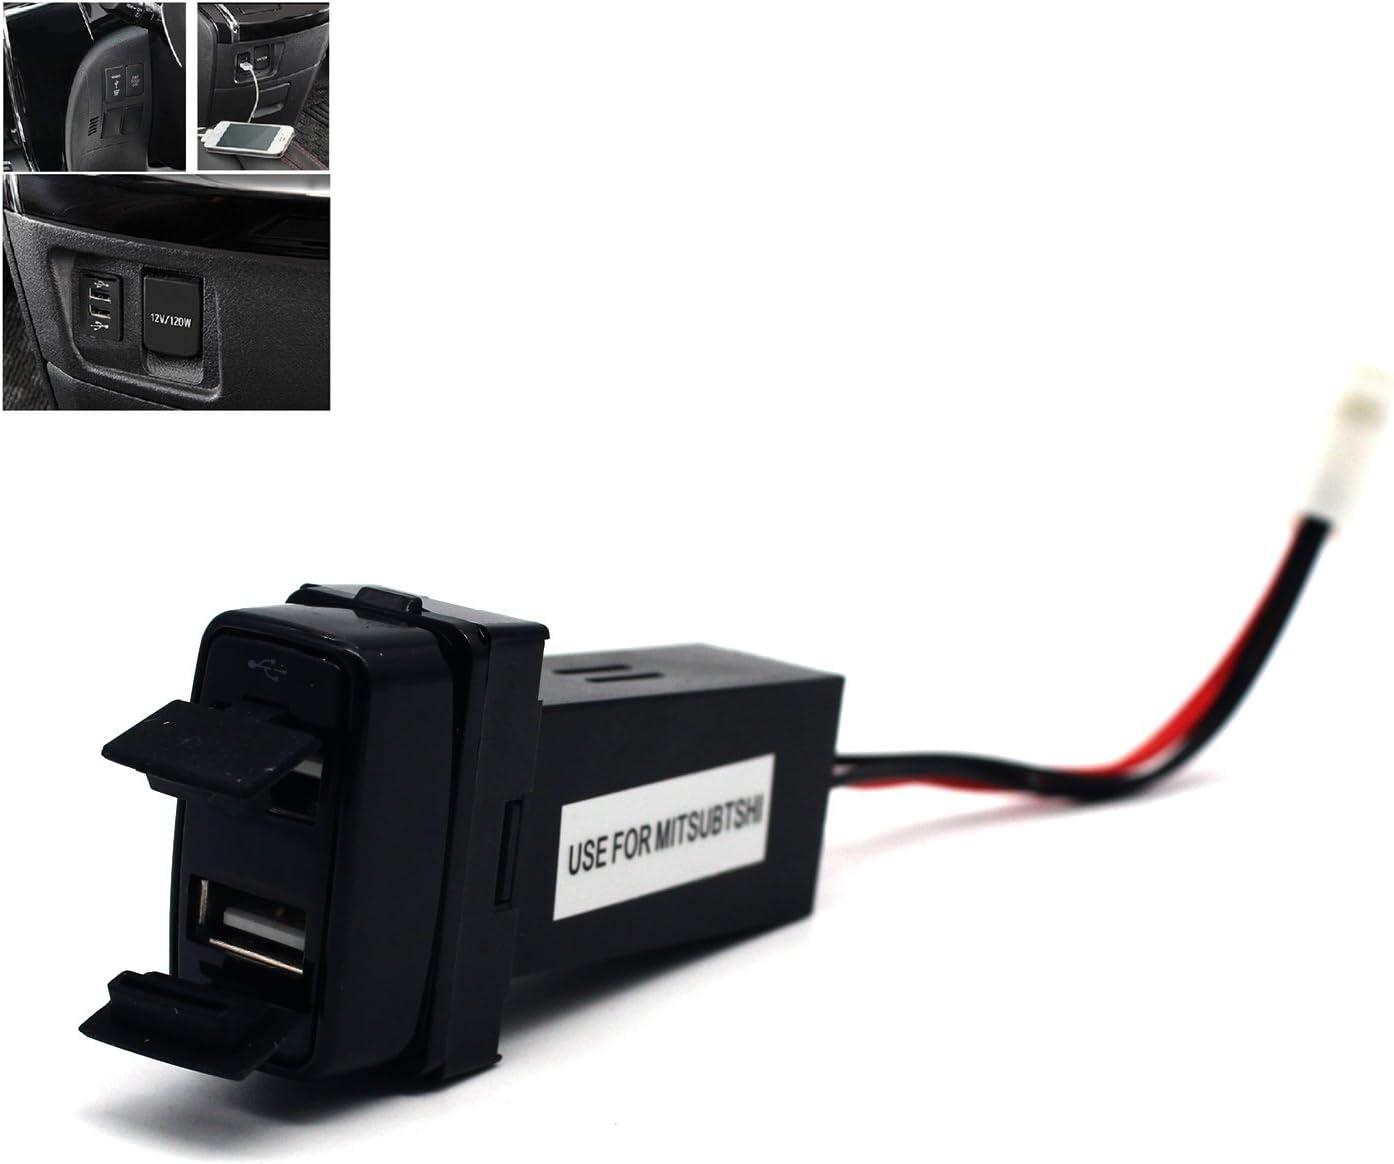 MOTONG 2.1A Dual USB Socket for Mitsubishi - Mitsubishi 2.1A Dual USB Power Socket Port for iPhone X/8/7/6/5, iPad, Samsung,LG,Huawei and More